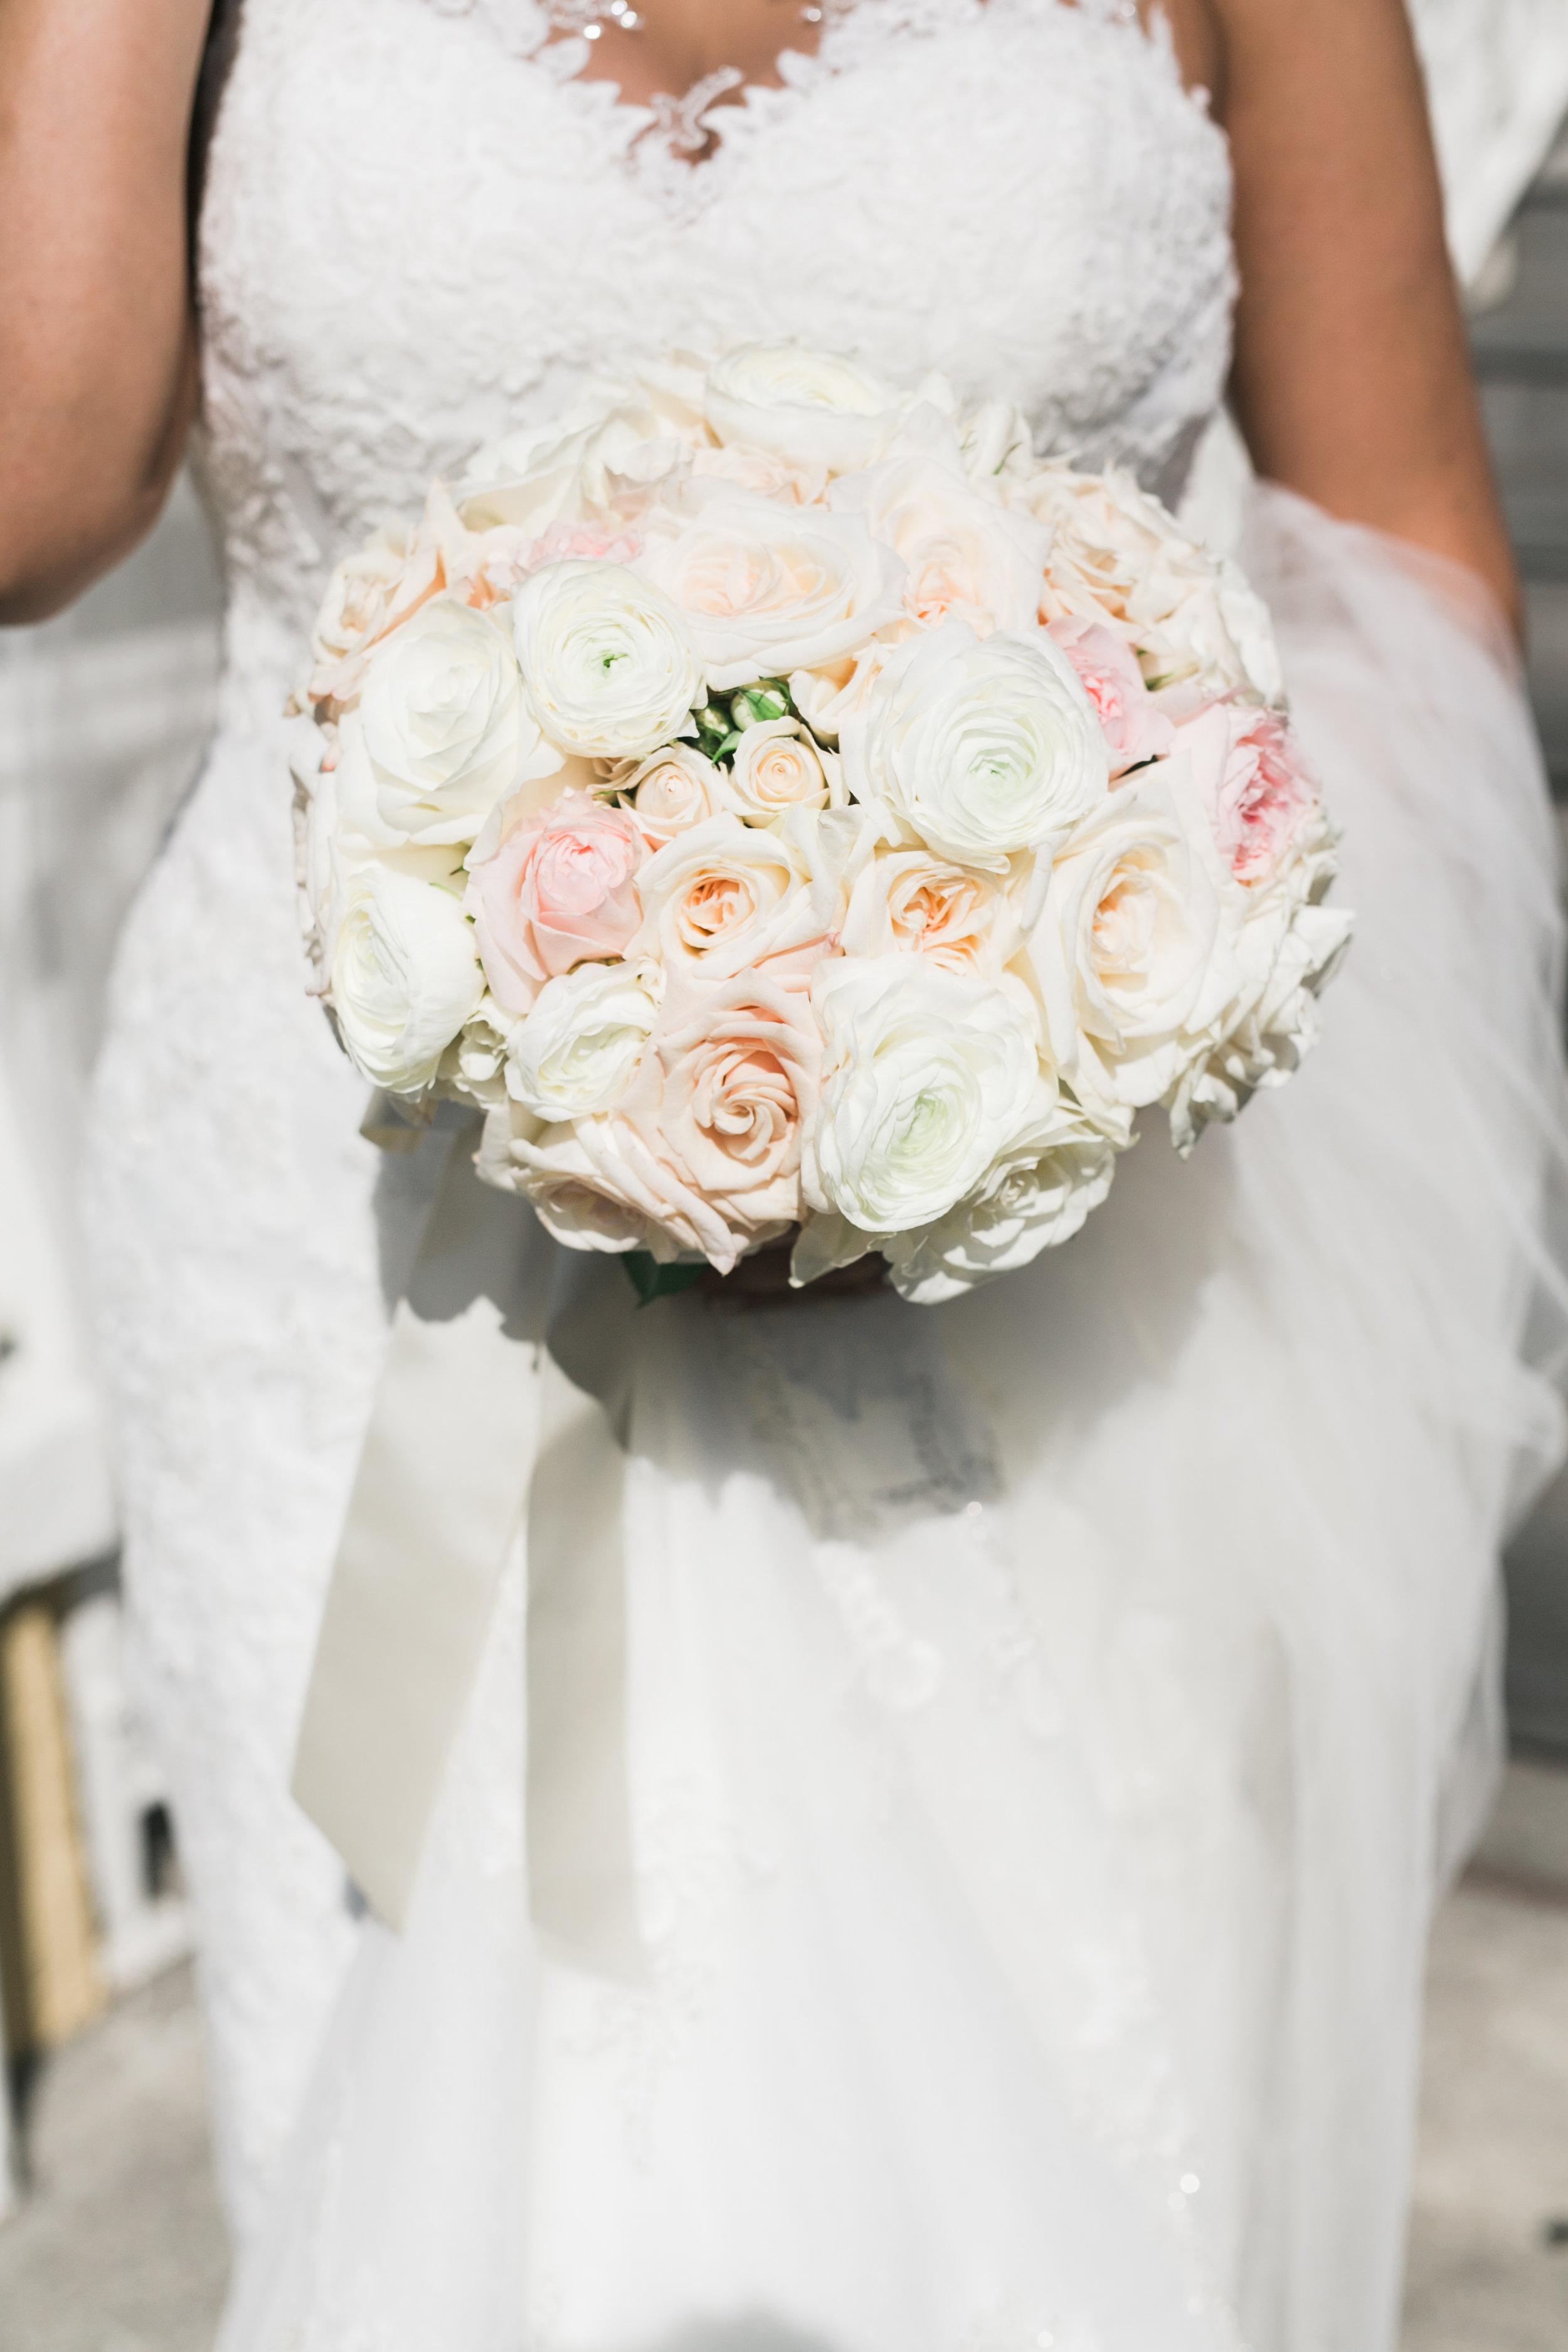 jenny-and-george-wedding-roque-events-meyerott-photography 345.jpg